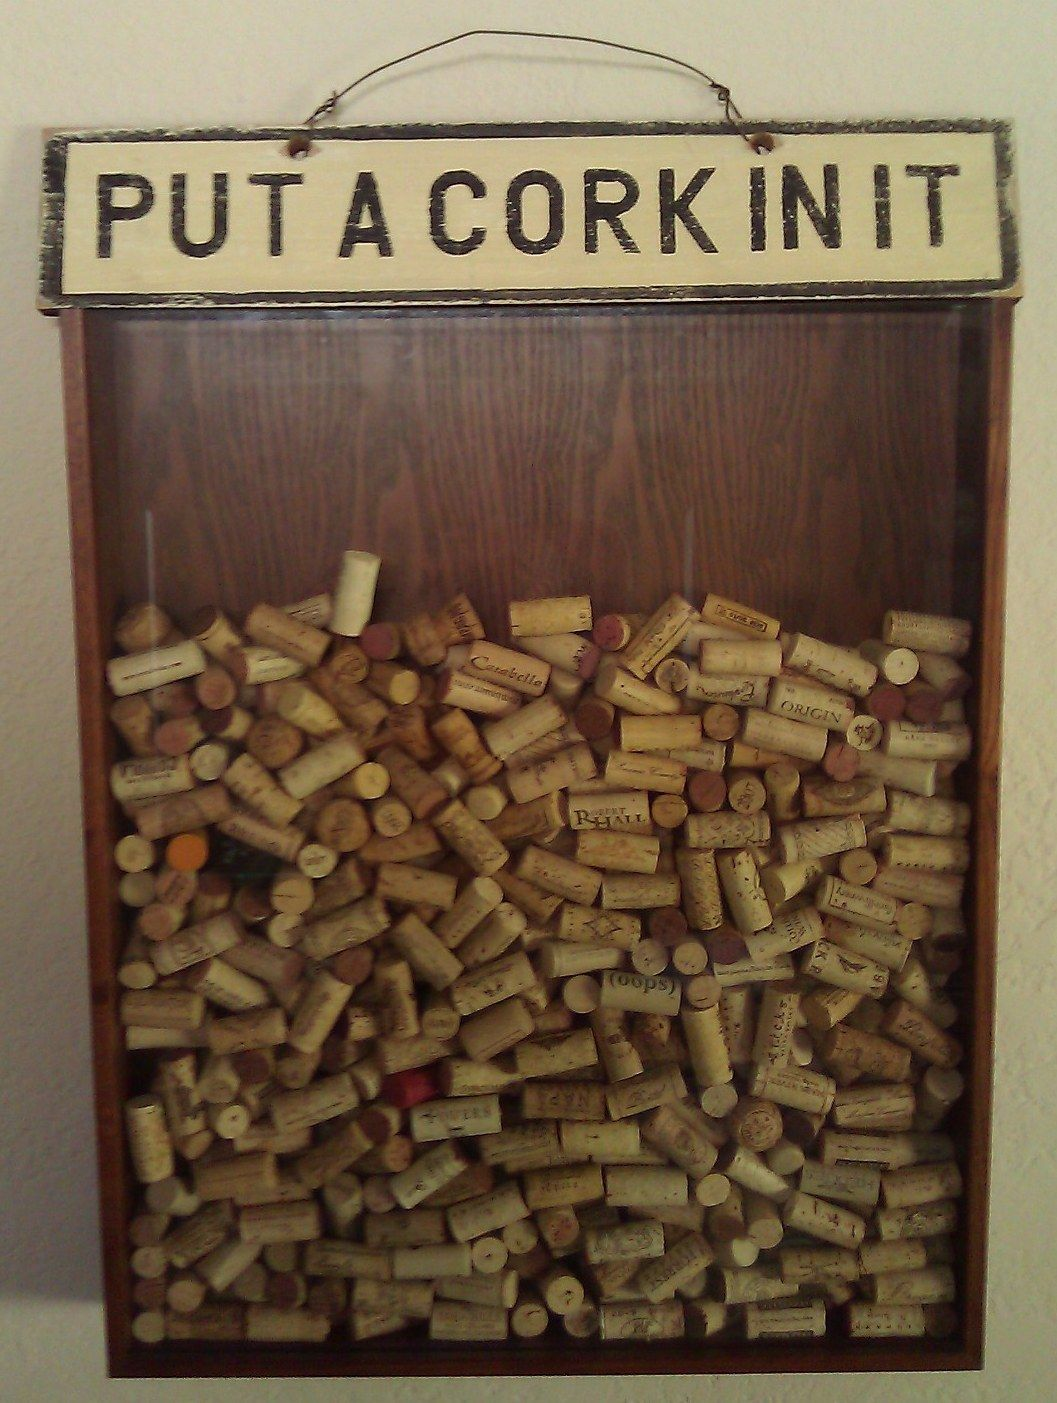 Pin by sandra janics on wine cork projects pinterest - Wine cork diy decorating projects ...